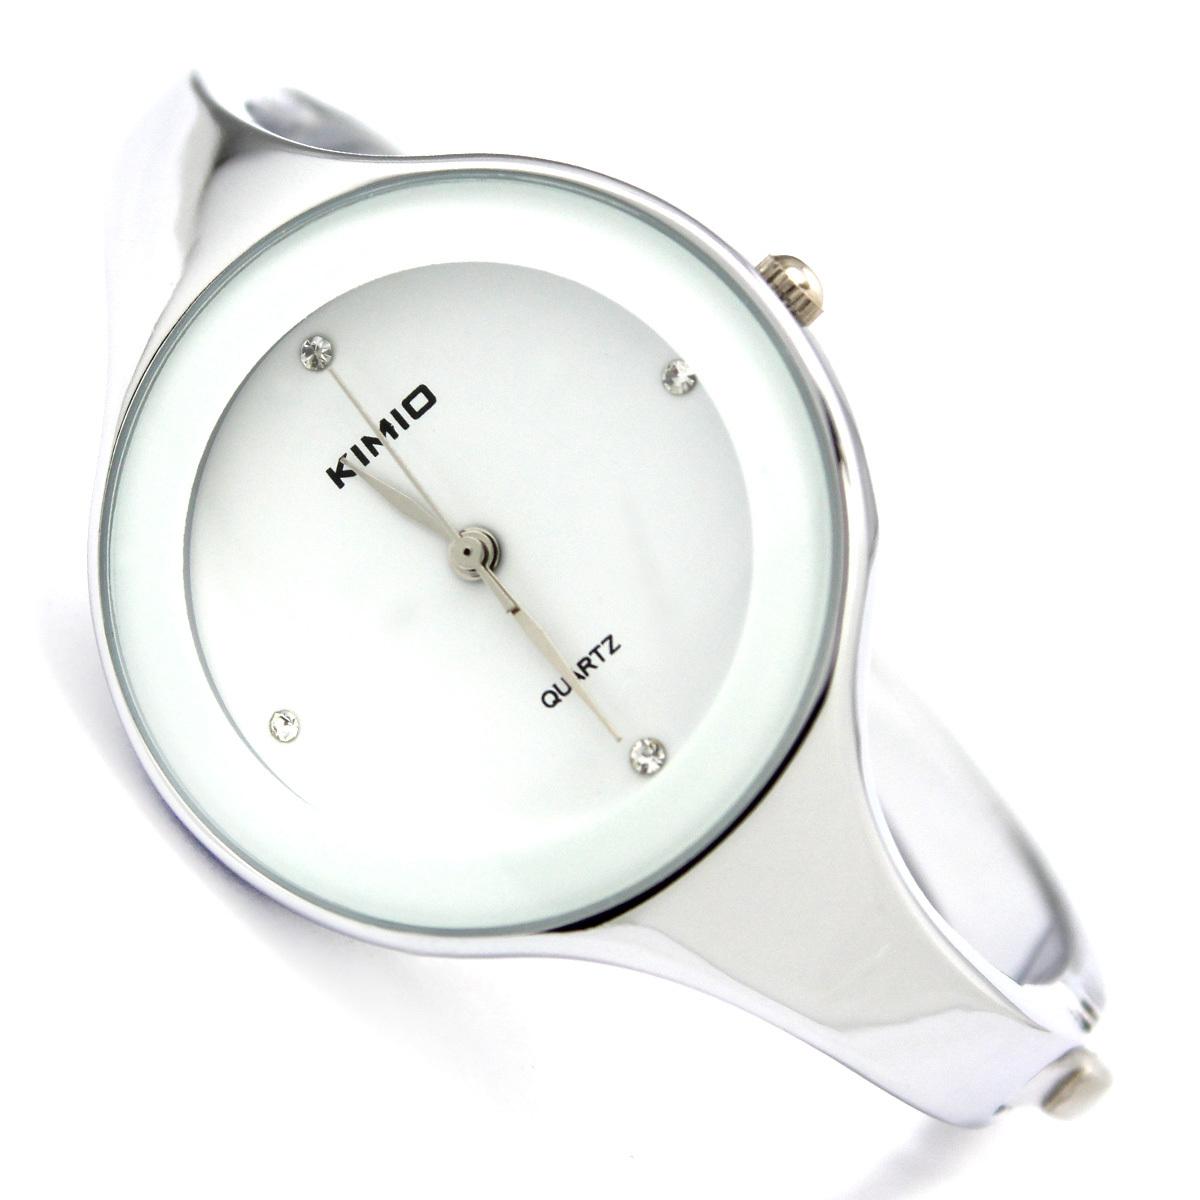 Часы Kimio 2682 Кварцевые часы Женские Китай 2010